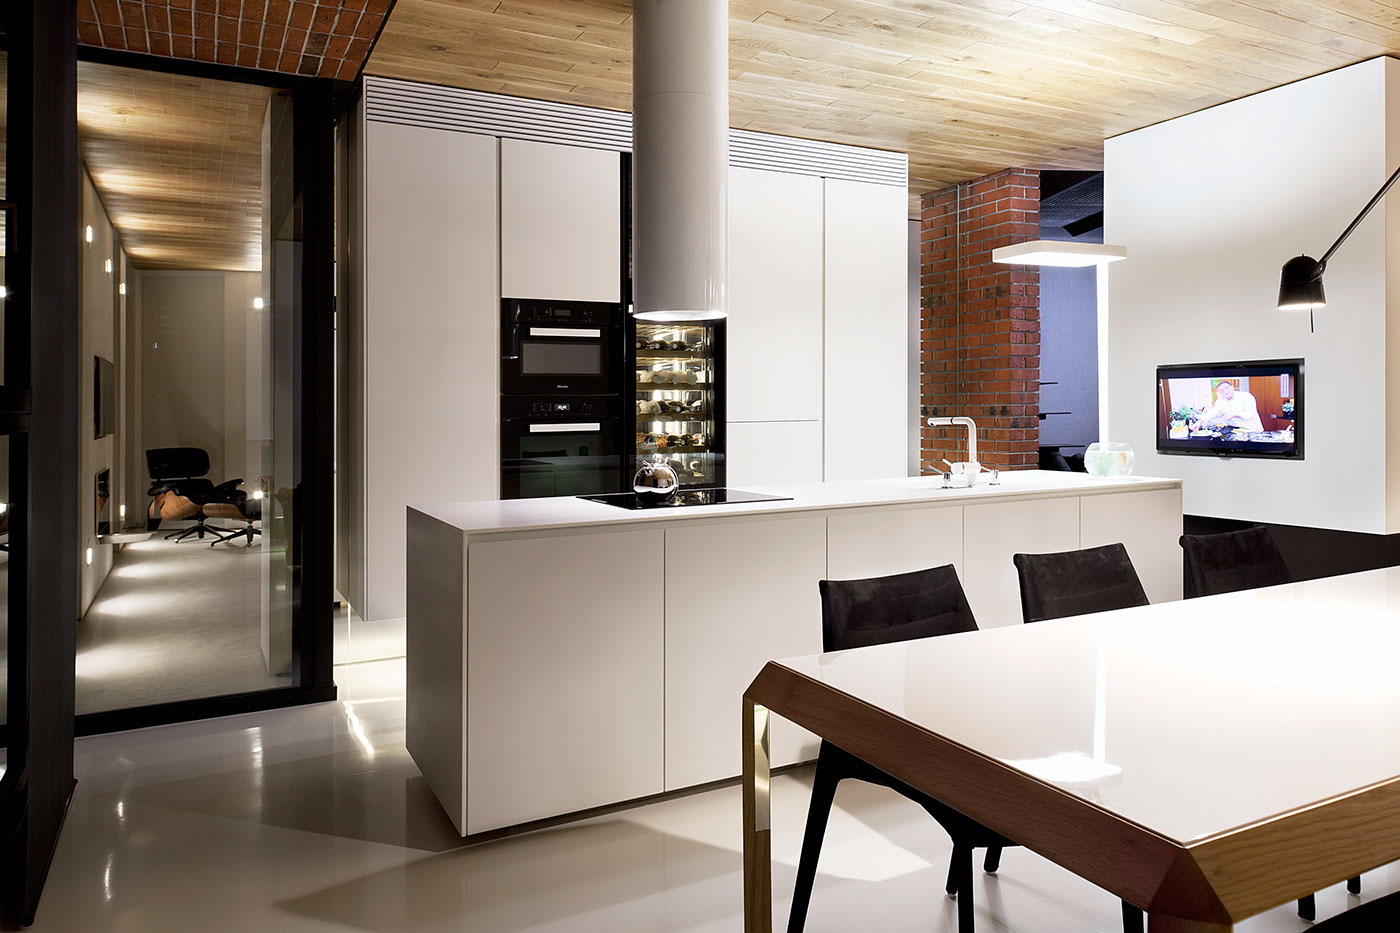 studio mode7 Loft Apartment By Studio Mode